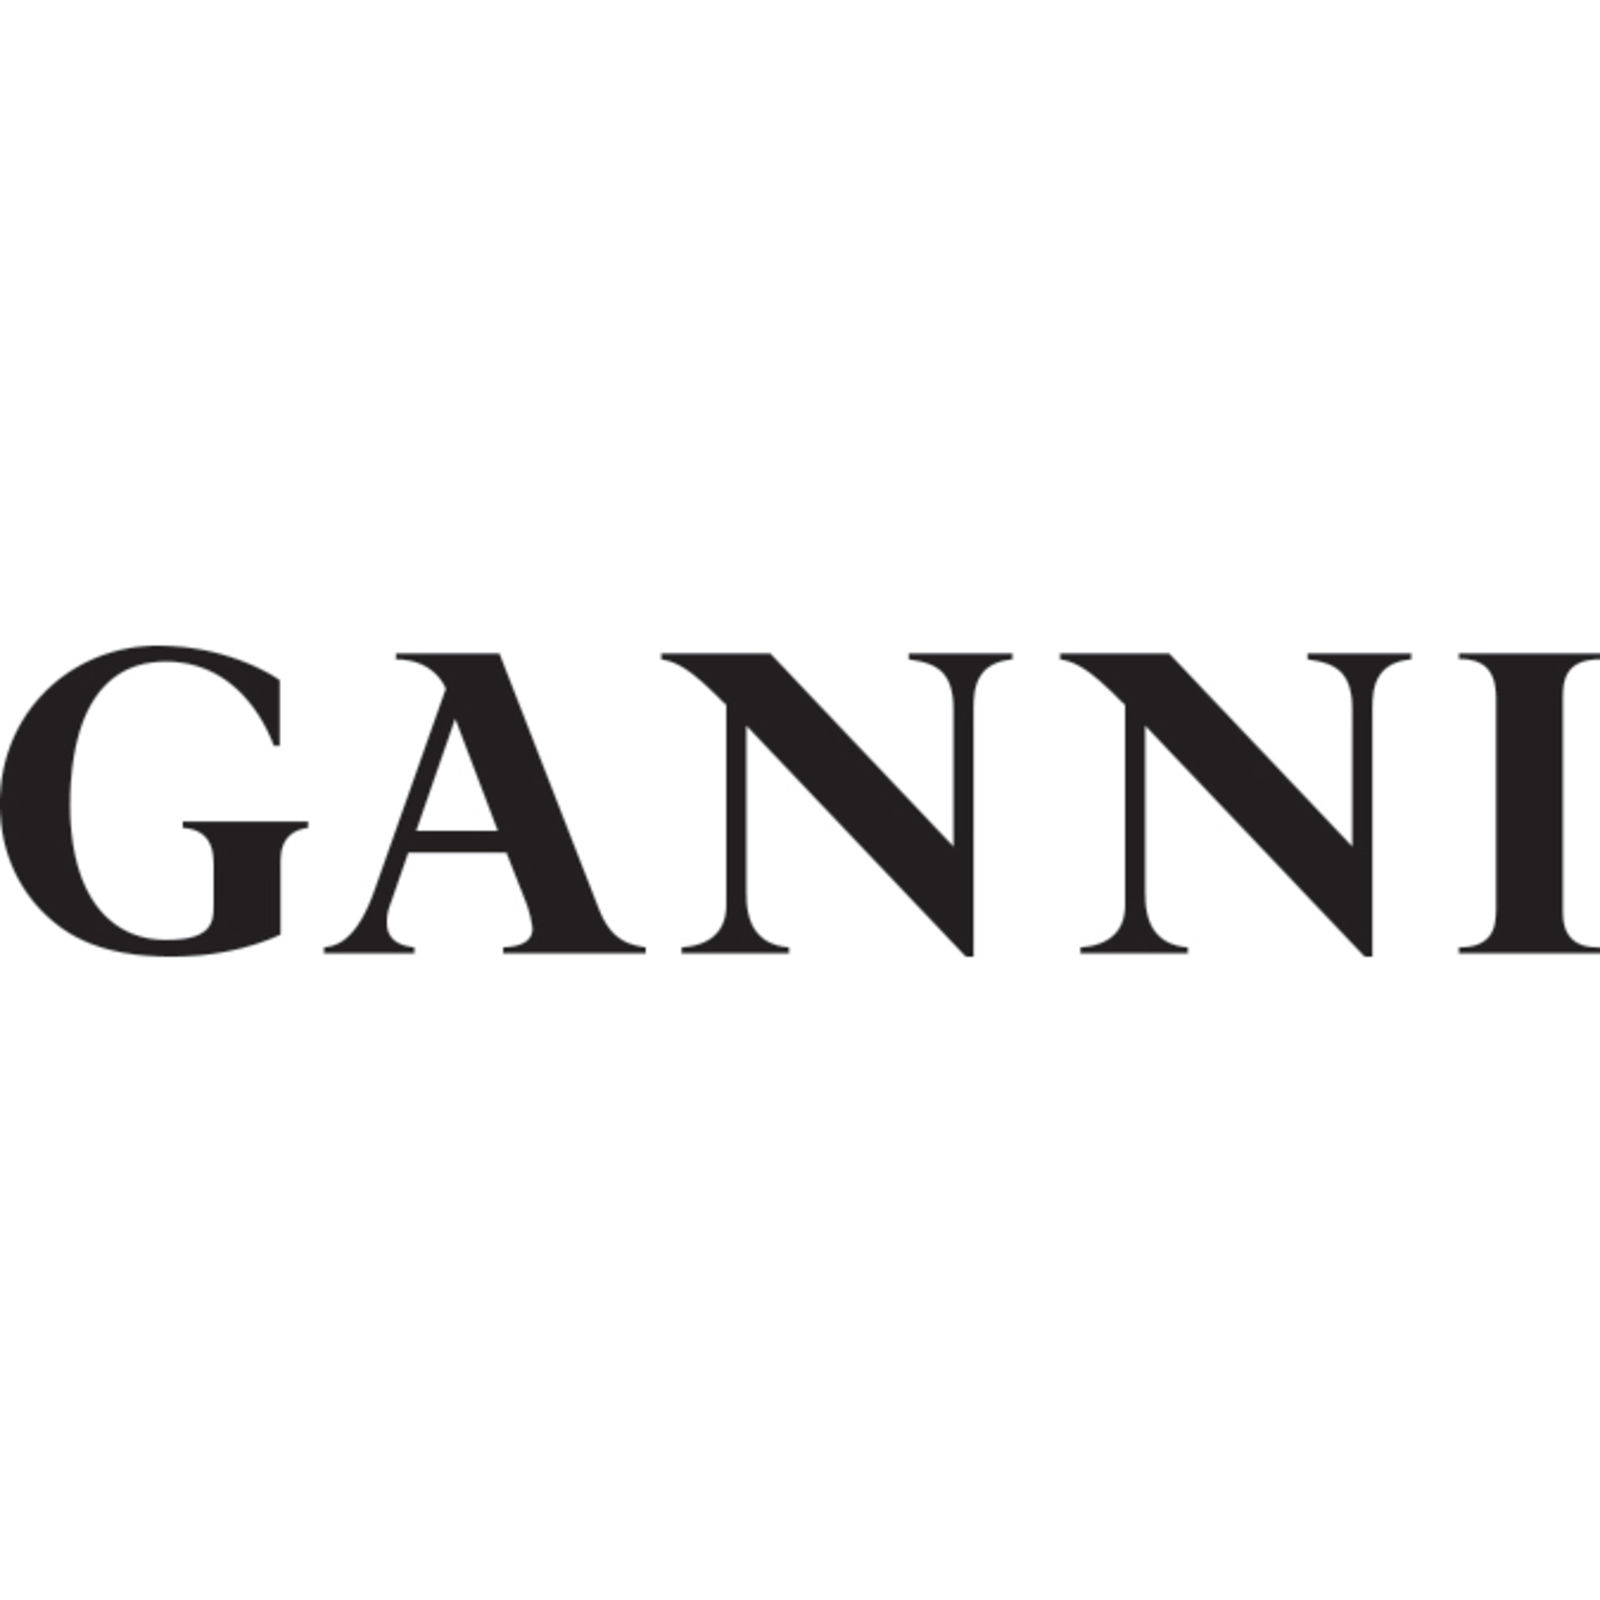 GANNI (Image 1)